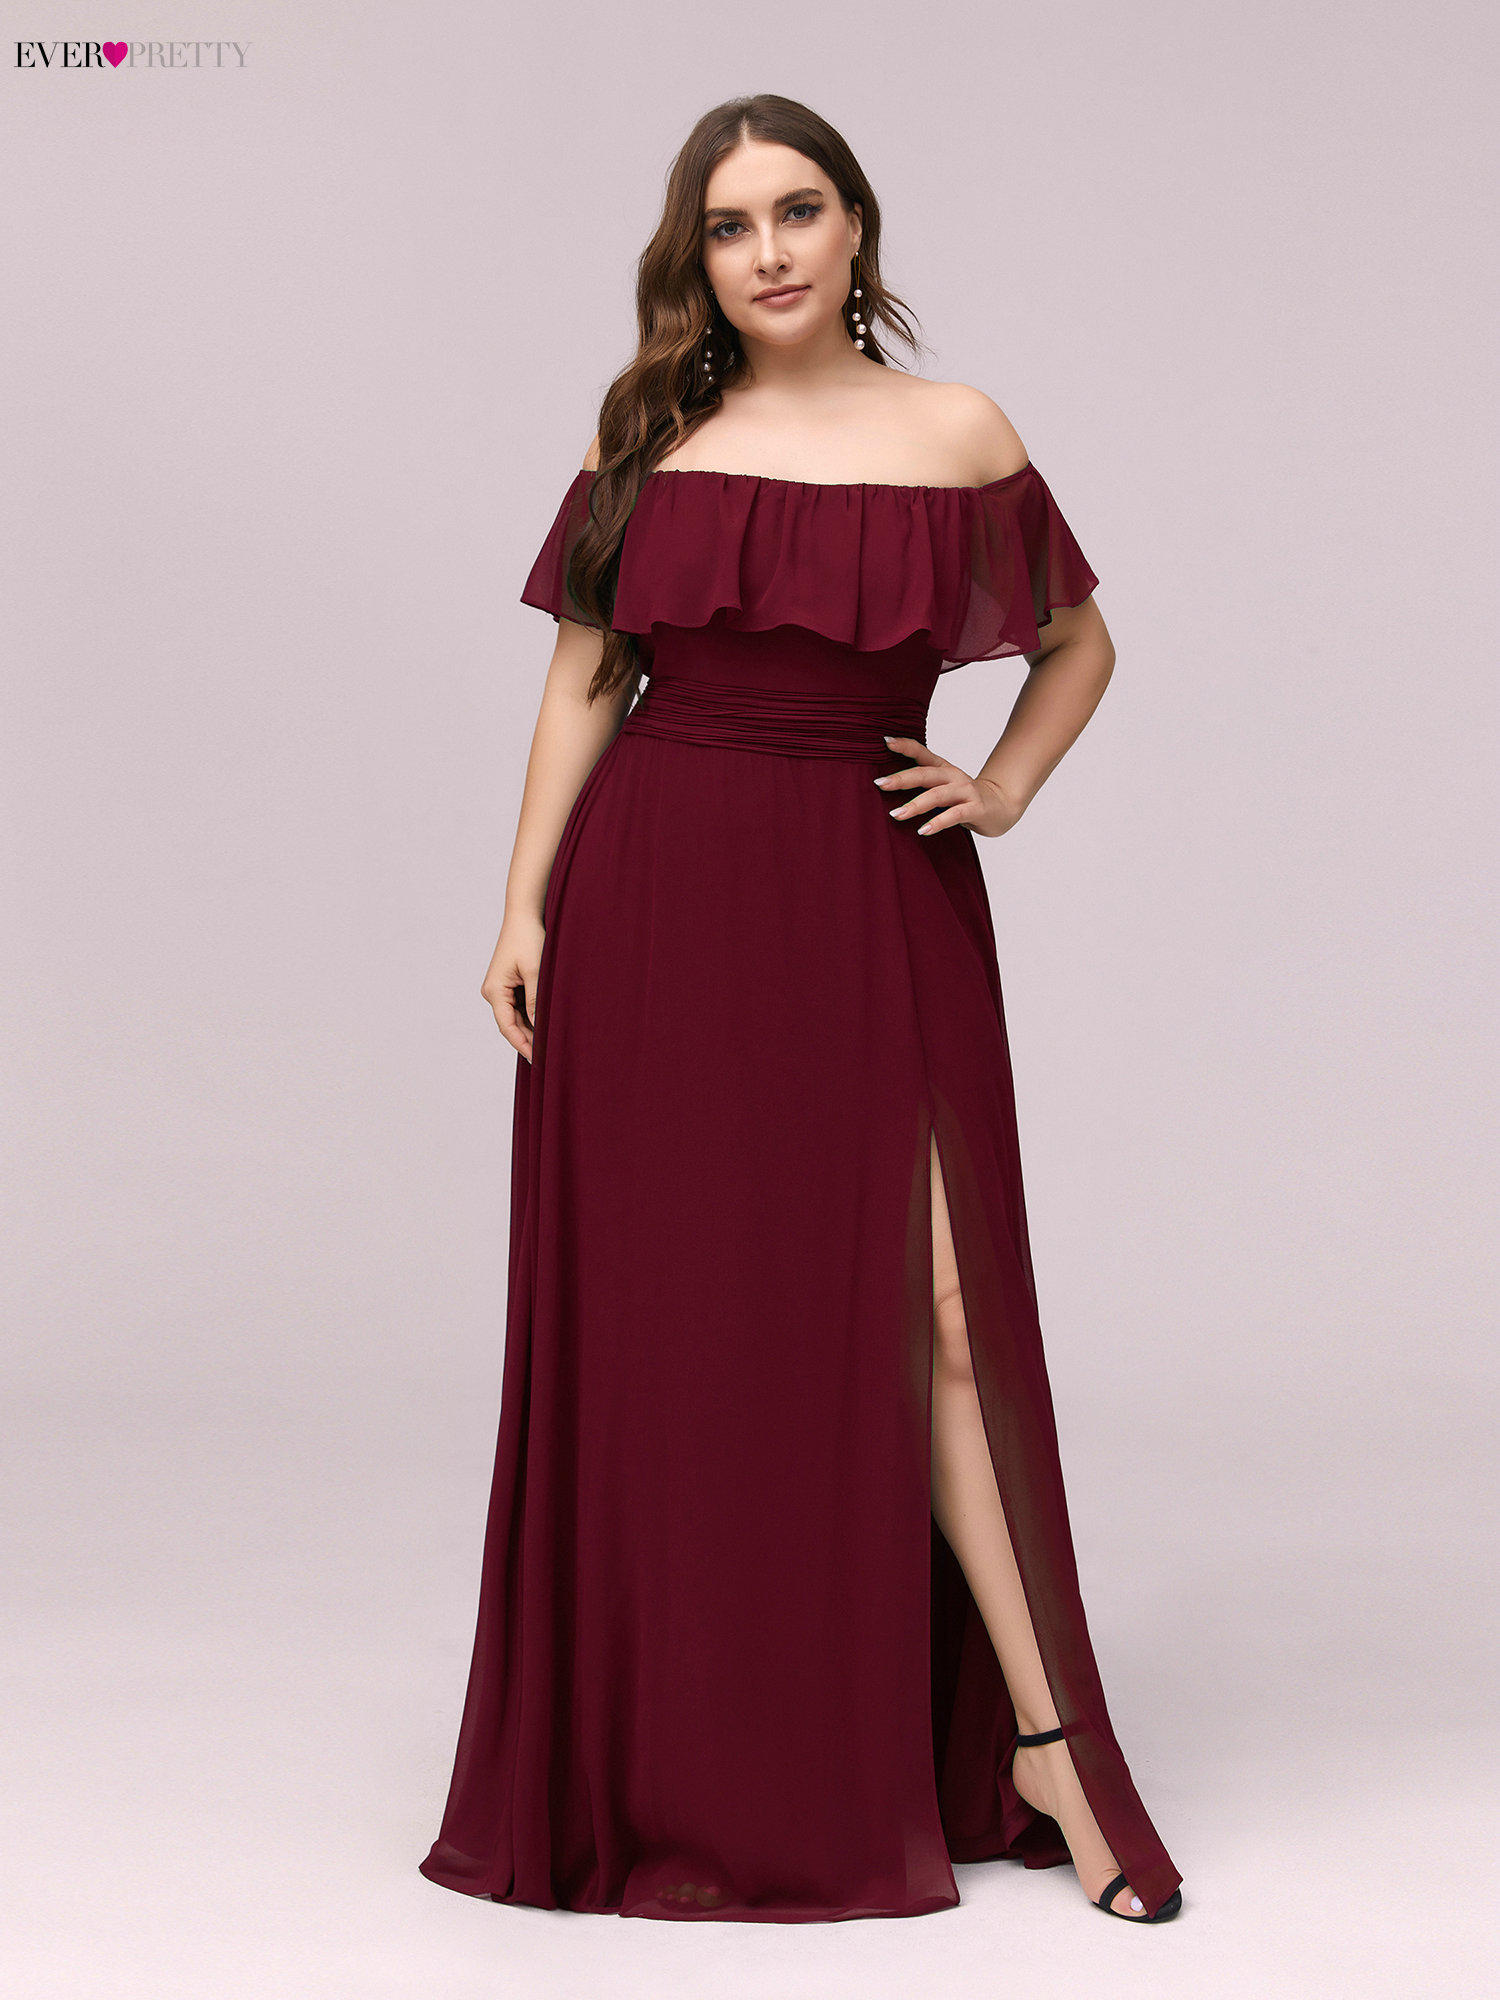 Bridesmaid-Dresses Boat Ever Pretty Wedding Pink Plus-Size Neck A-Line for Party Vestidos-De-Madrinha